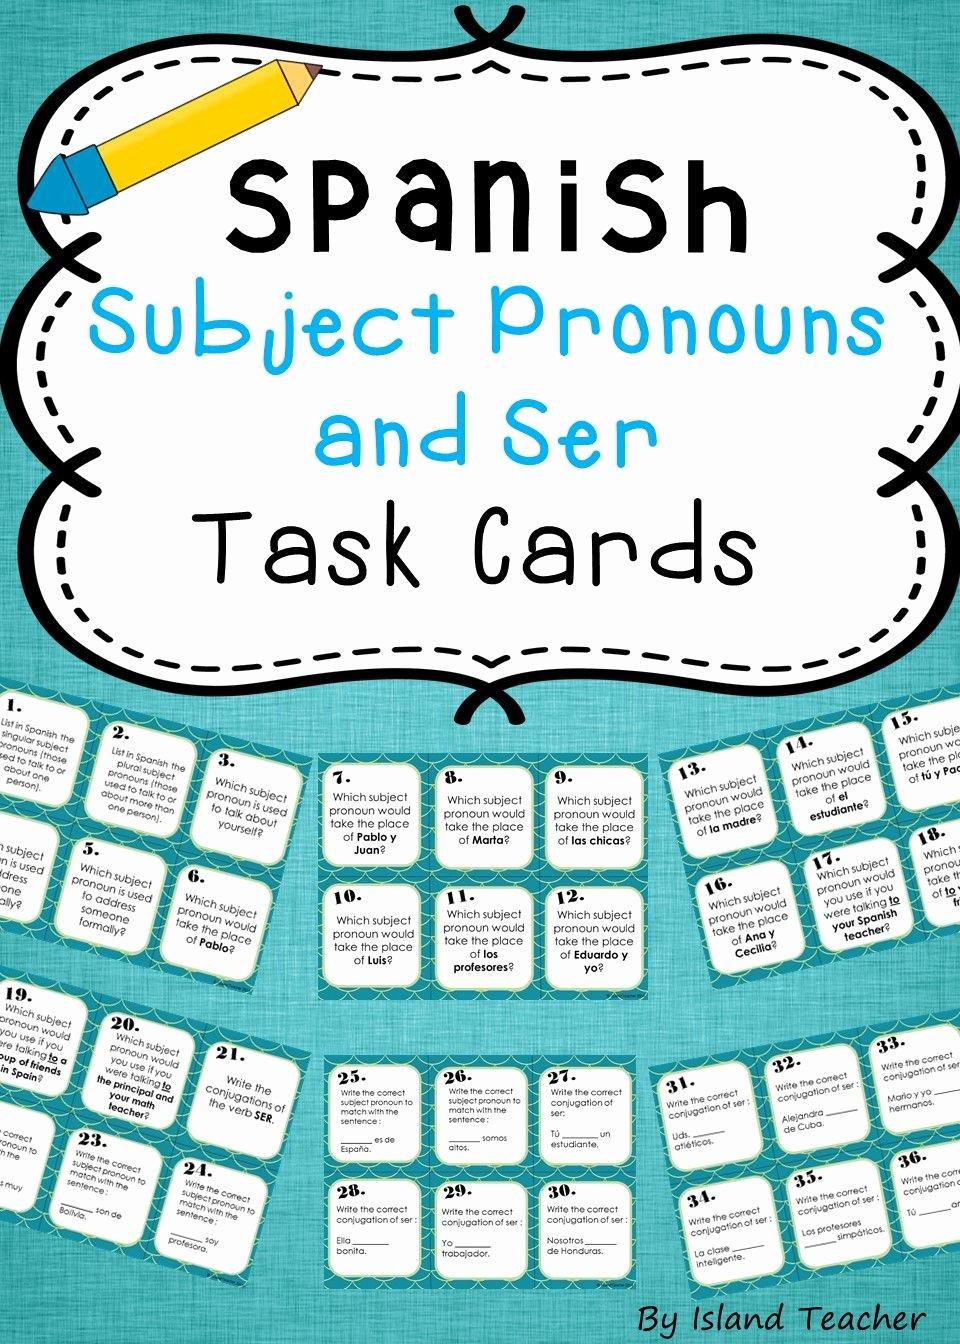 Spanish Subject Pronouns Worksheet Best Of Spanish Subject Pronouns and Ser Task Cards